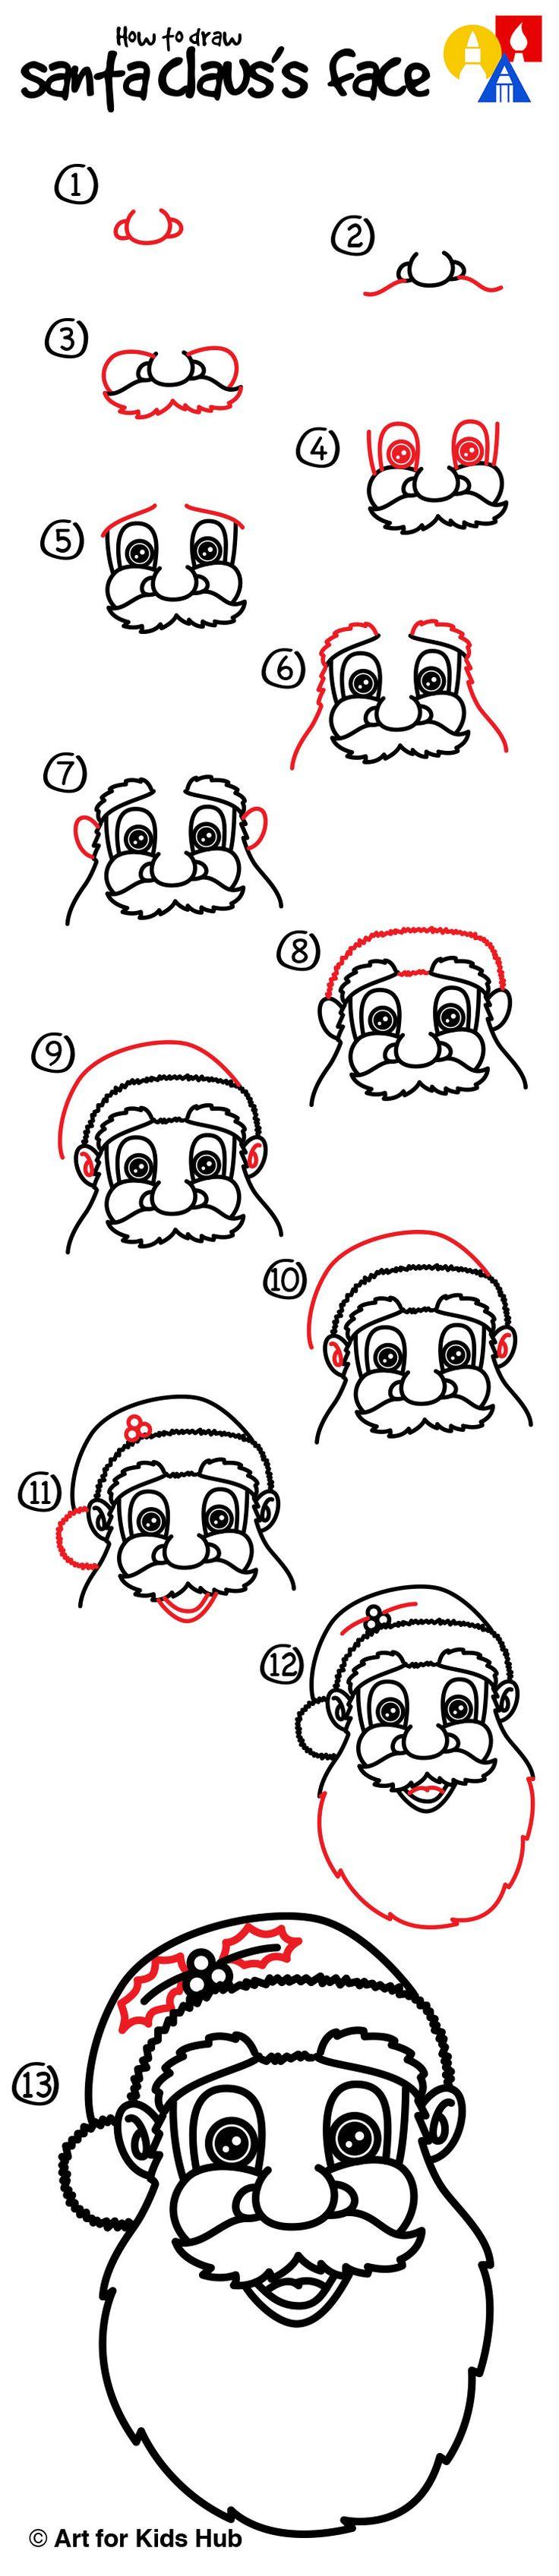 Dessiner facilement un Père Noël Dessin pere noel facile